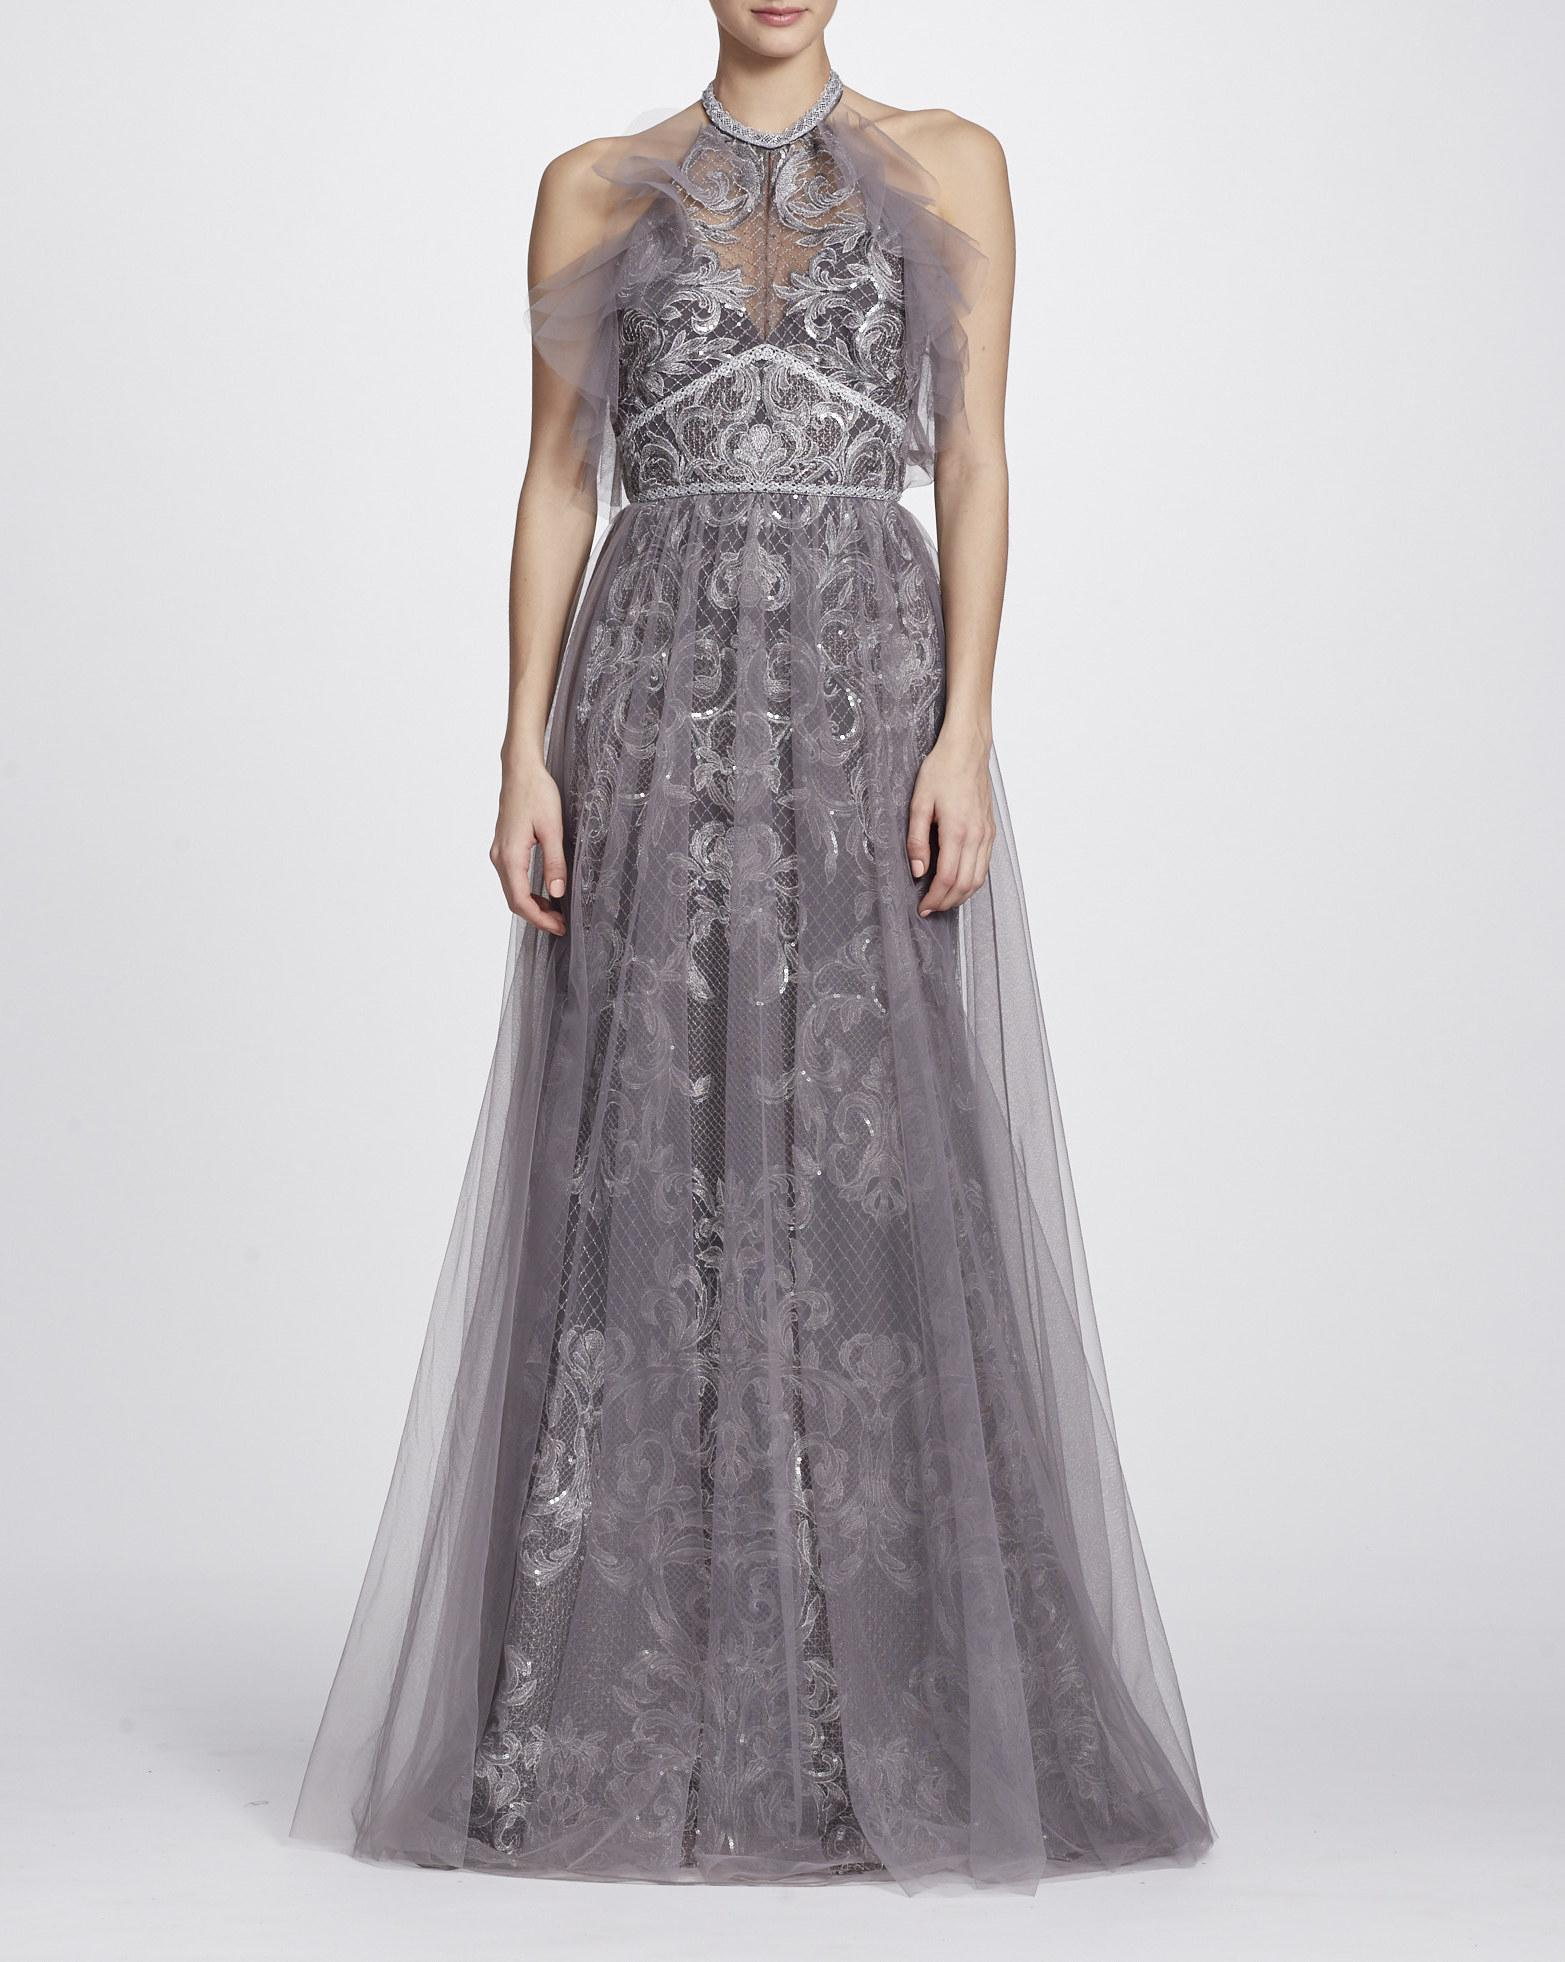 2981581b7db Marchesa Notte Sleeveless Halter Neck Evening Gown N24G0655 In Silver